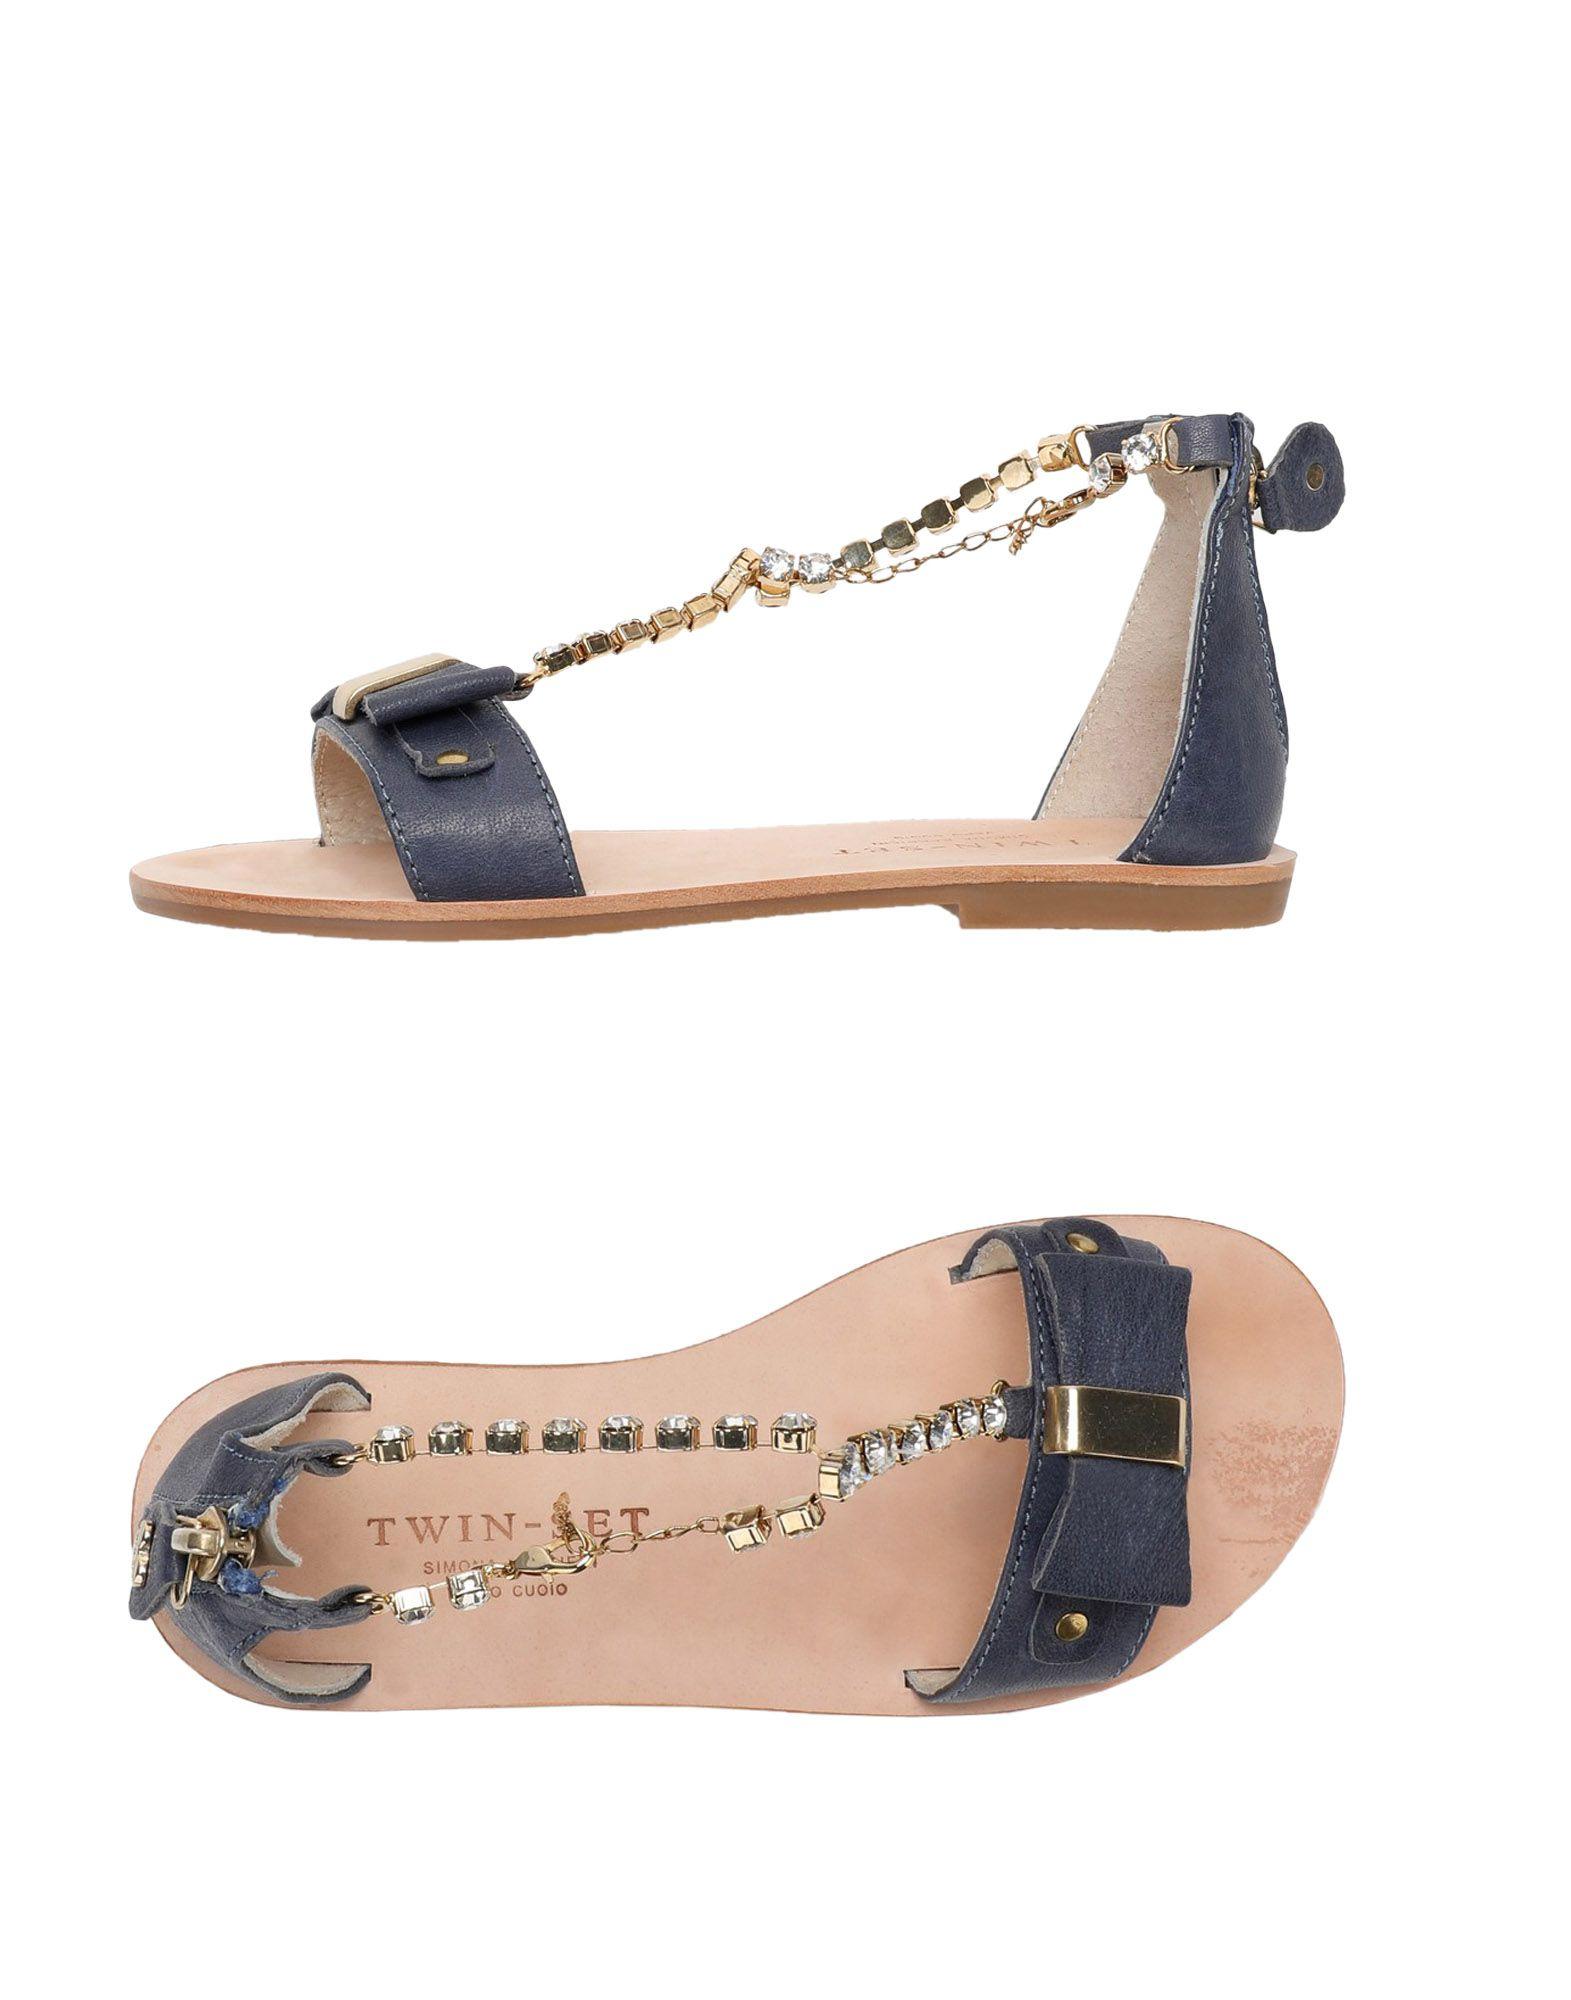 separation shoes 000b3 c921f Sandali Twinset Bambina 9-16 anni - Acquista online su YOOX